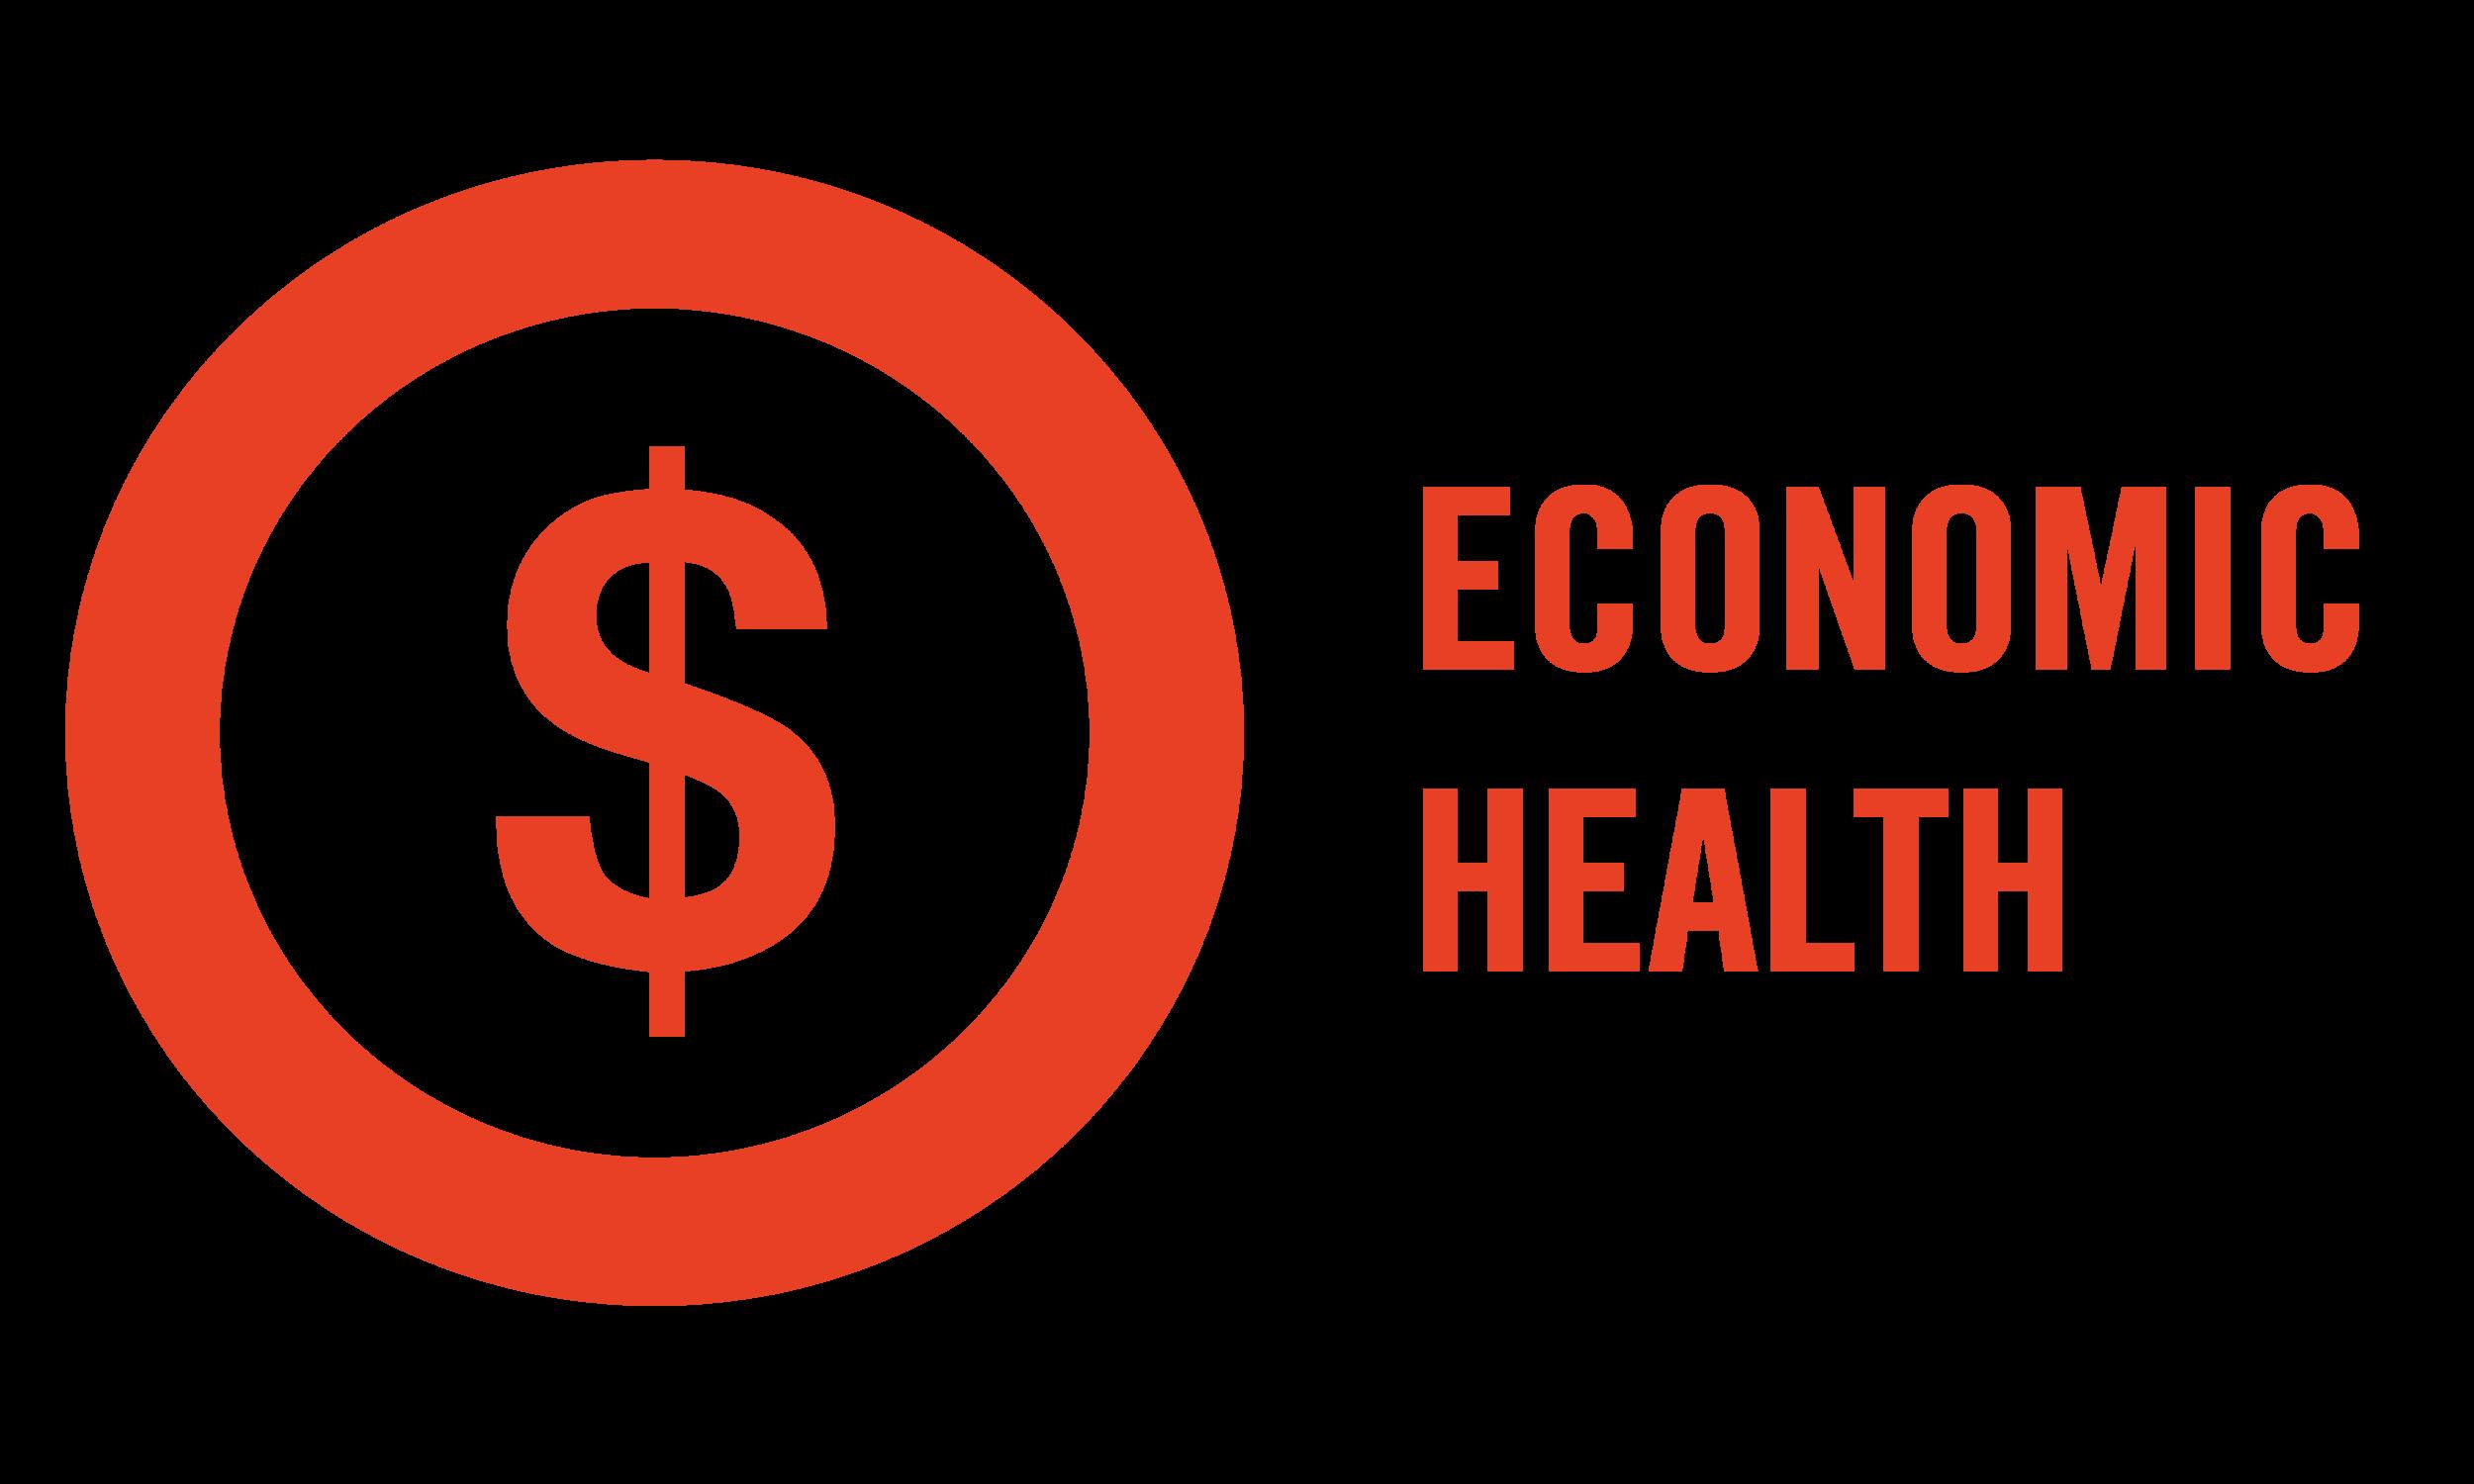 economic health.png